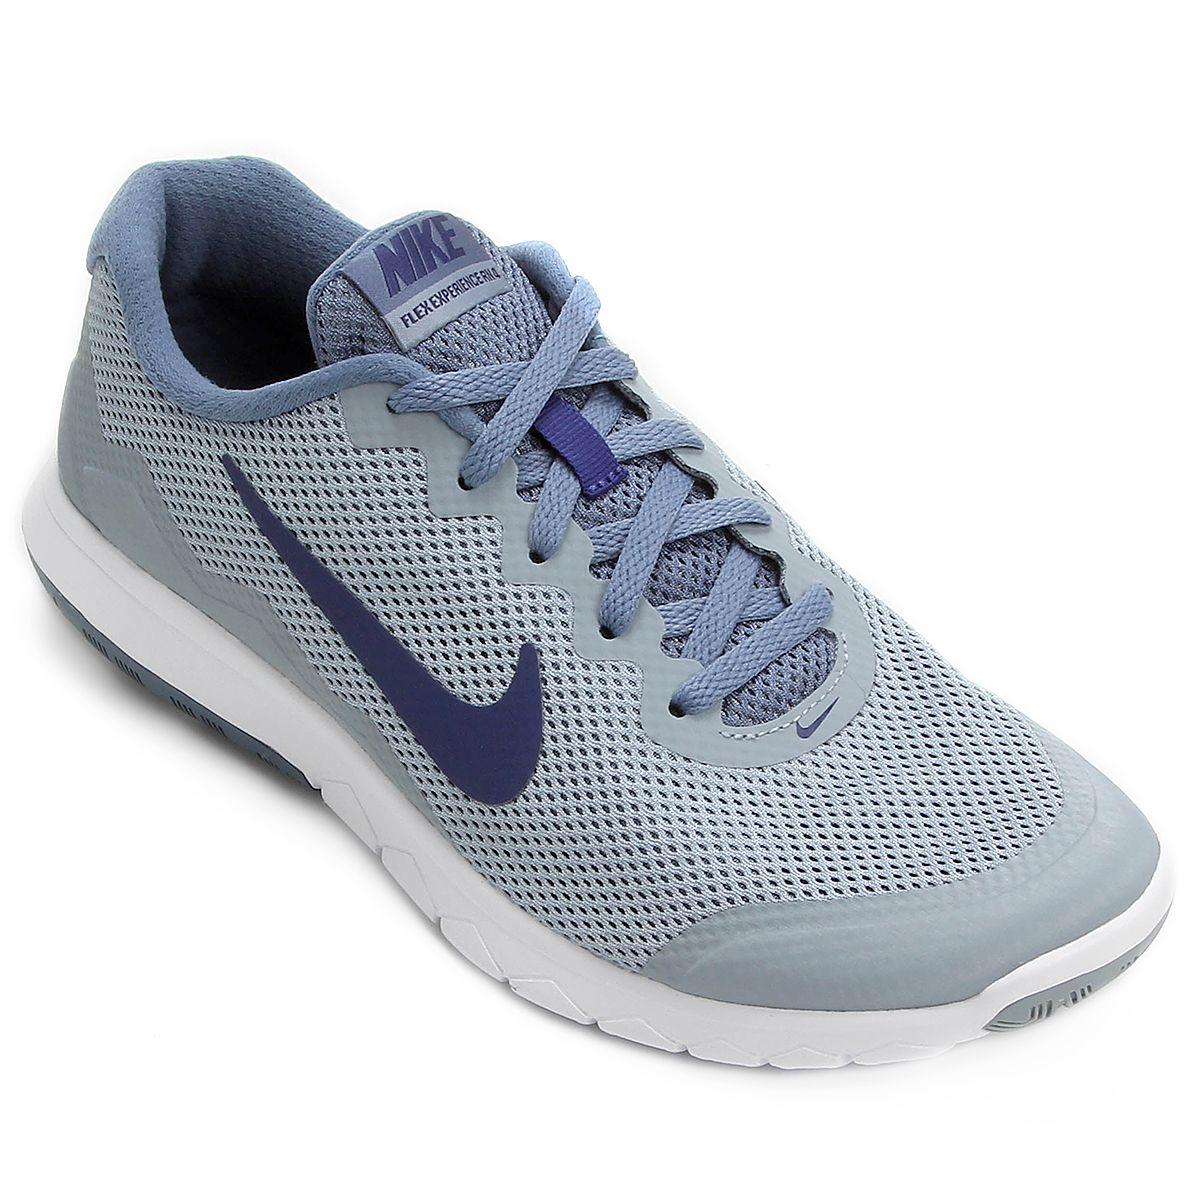 39694529ee0 Tênis Nike Flex Experience RN 4 Masculino - Azul Claro